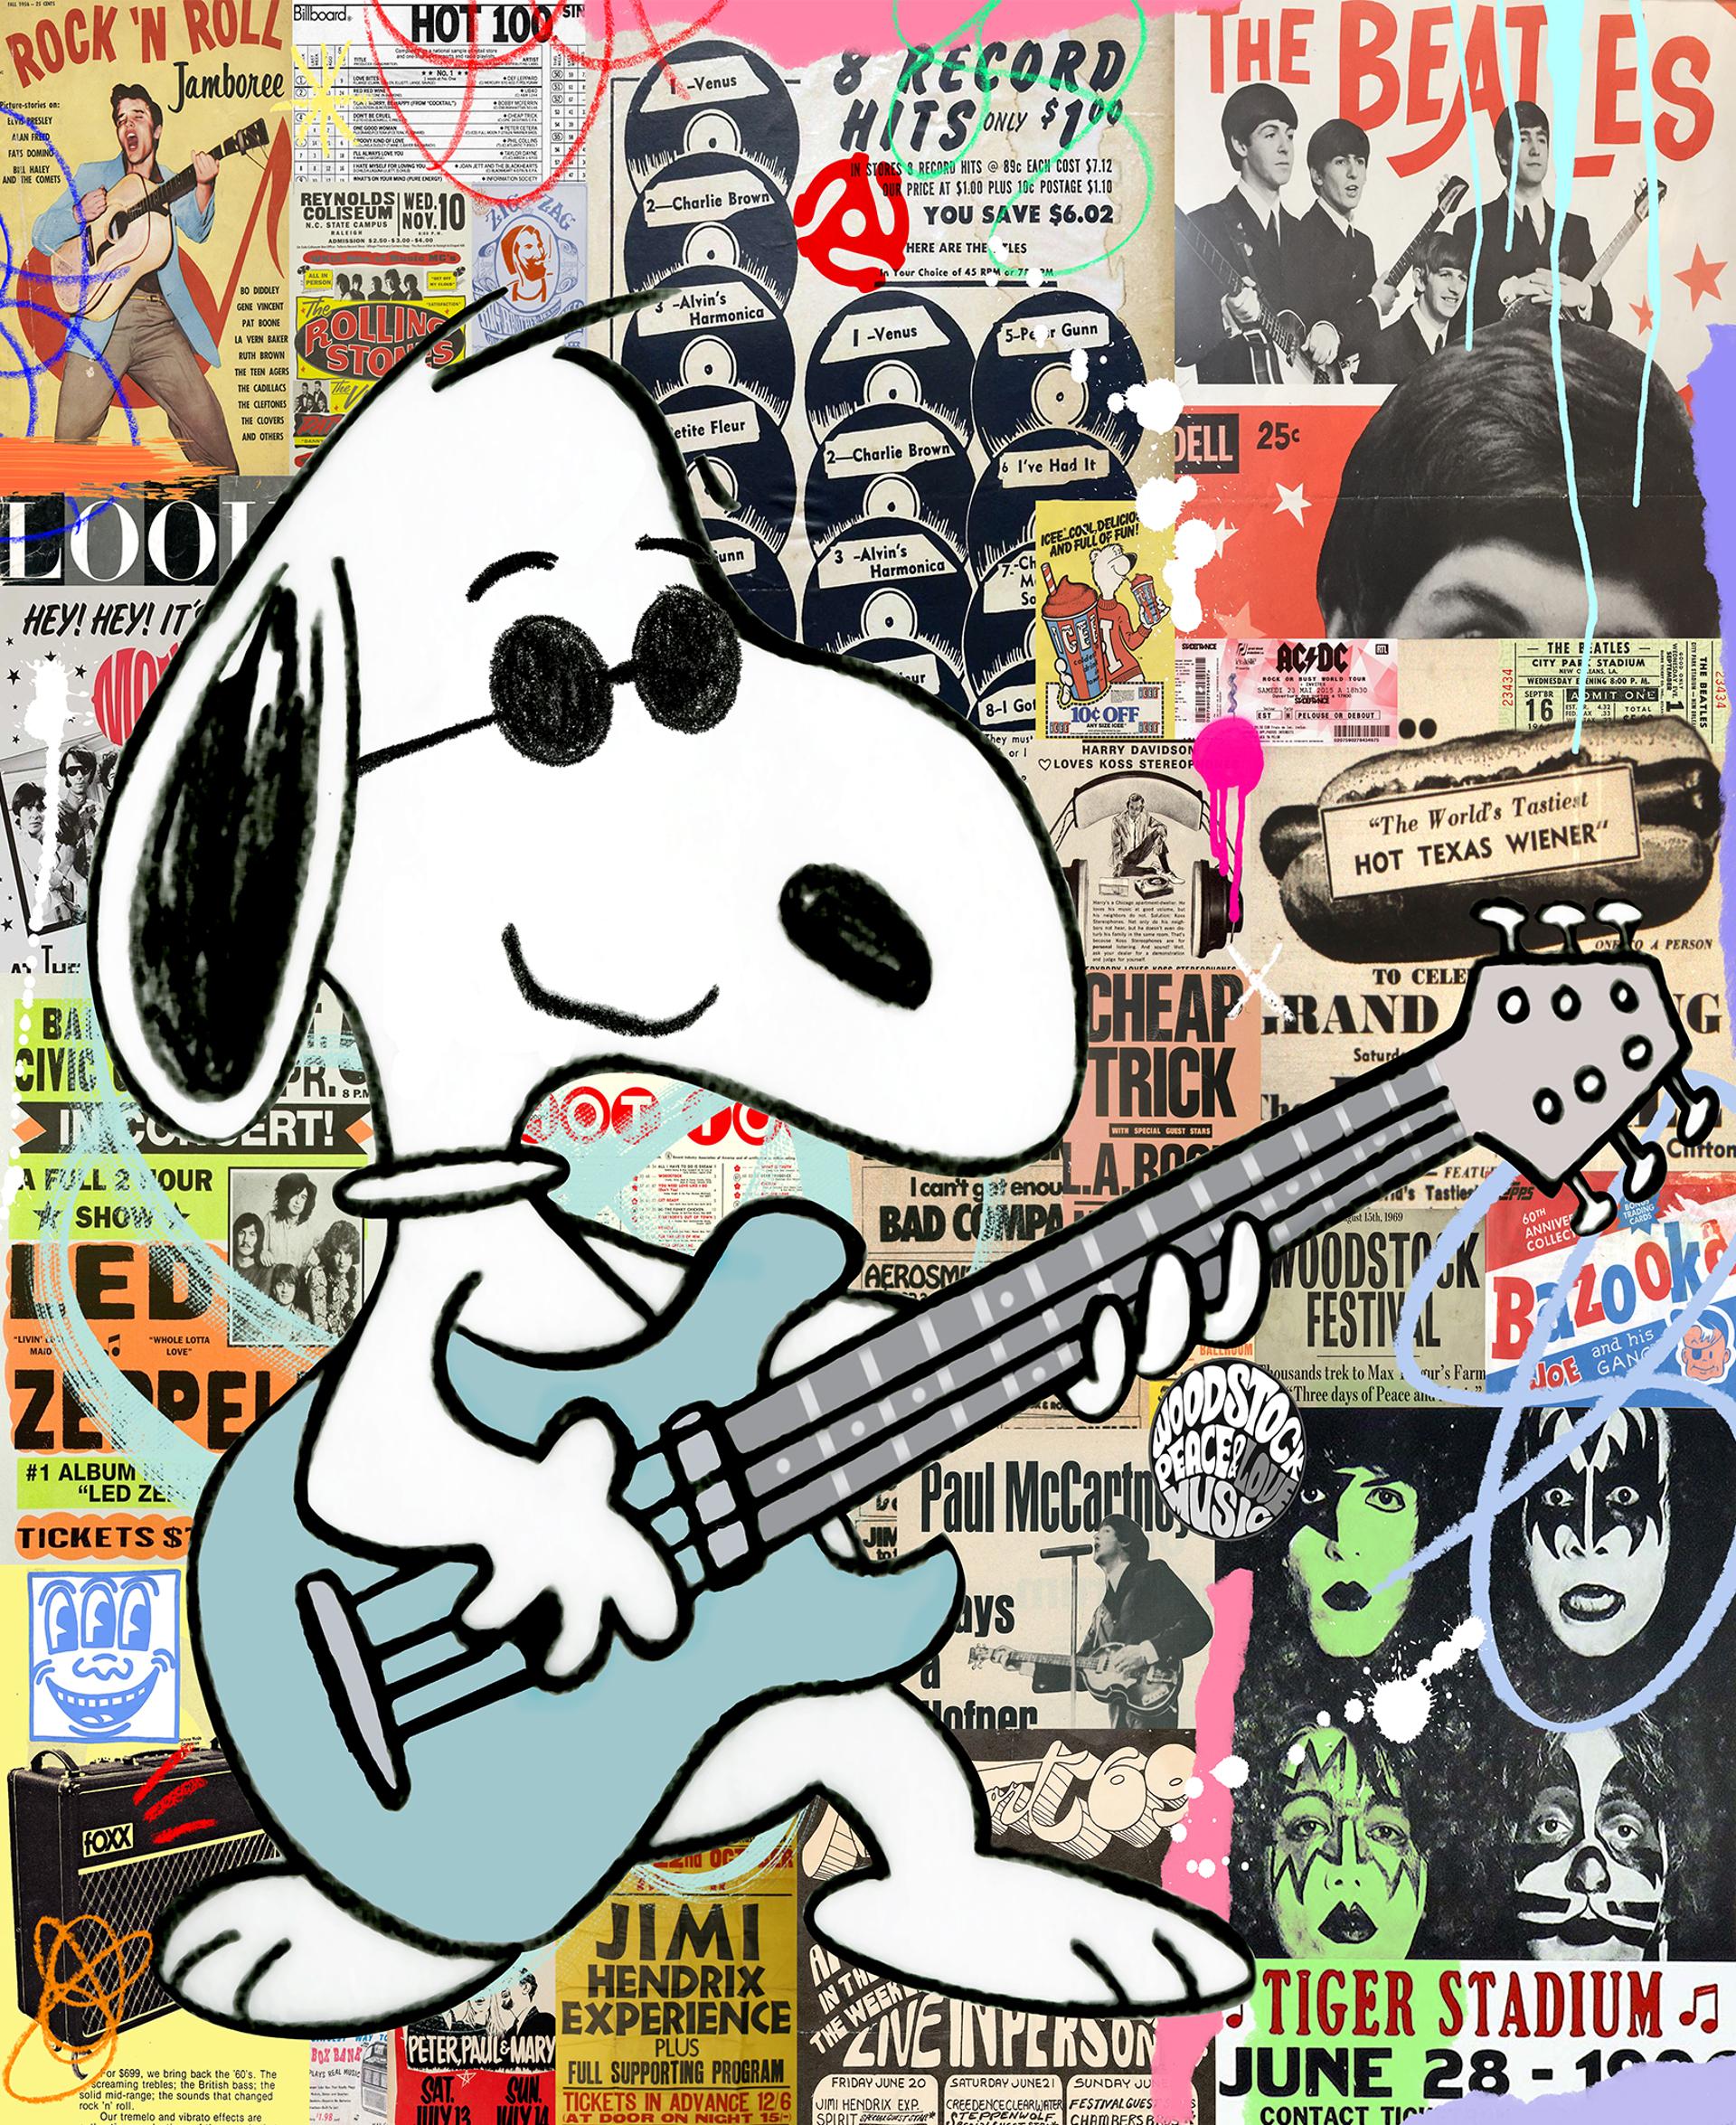 Rock Star by Nelson De La Nuez